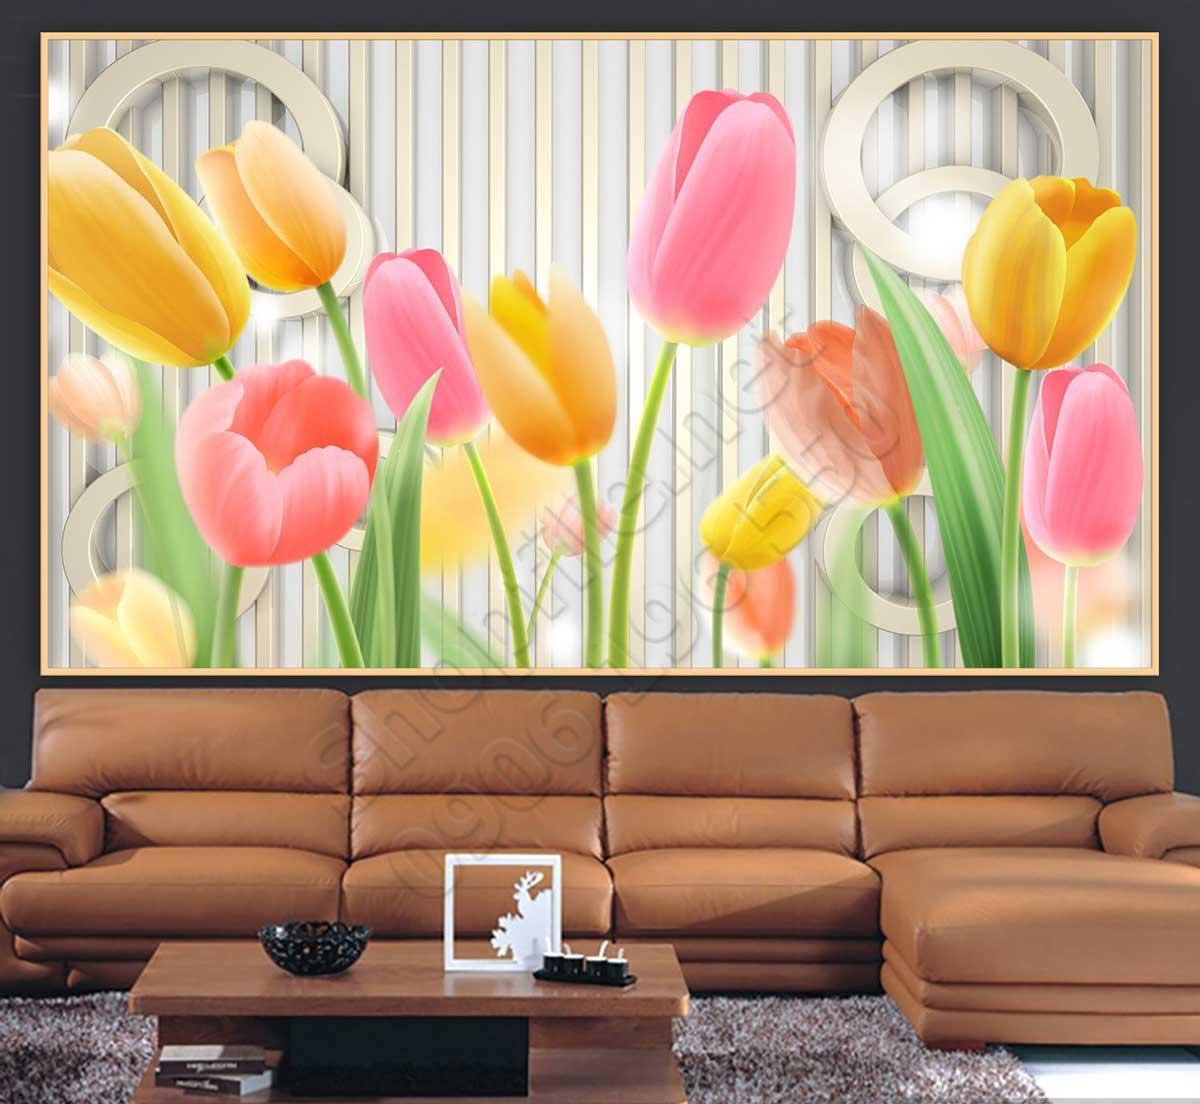 Tranh 3D Hoa Tulip Trang Trí - NS1154